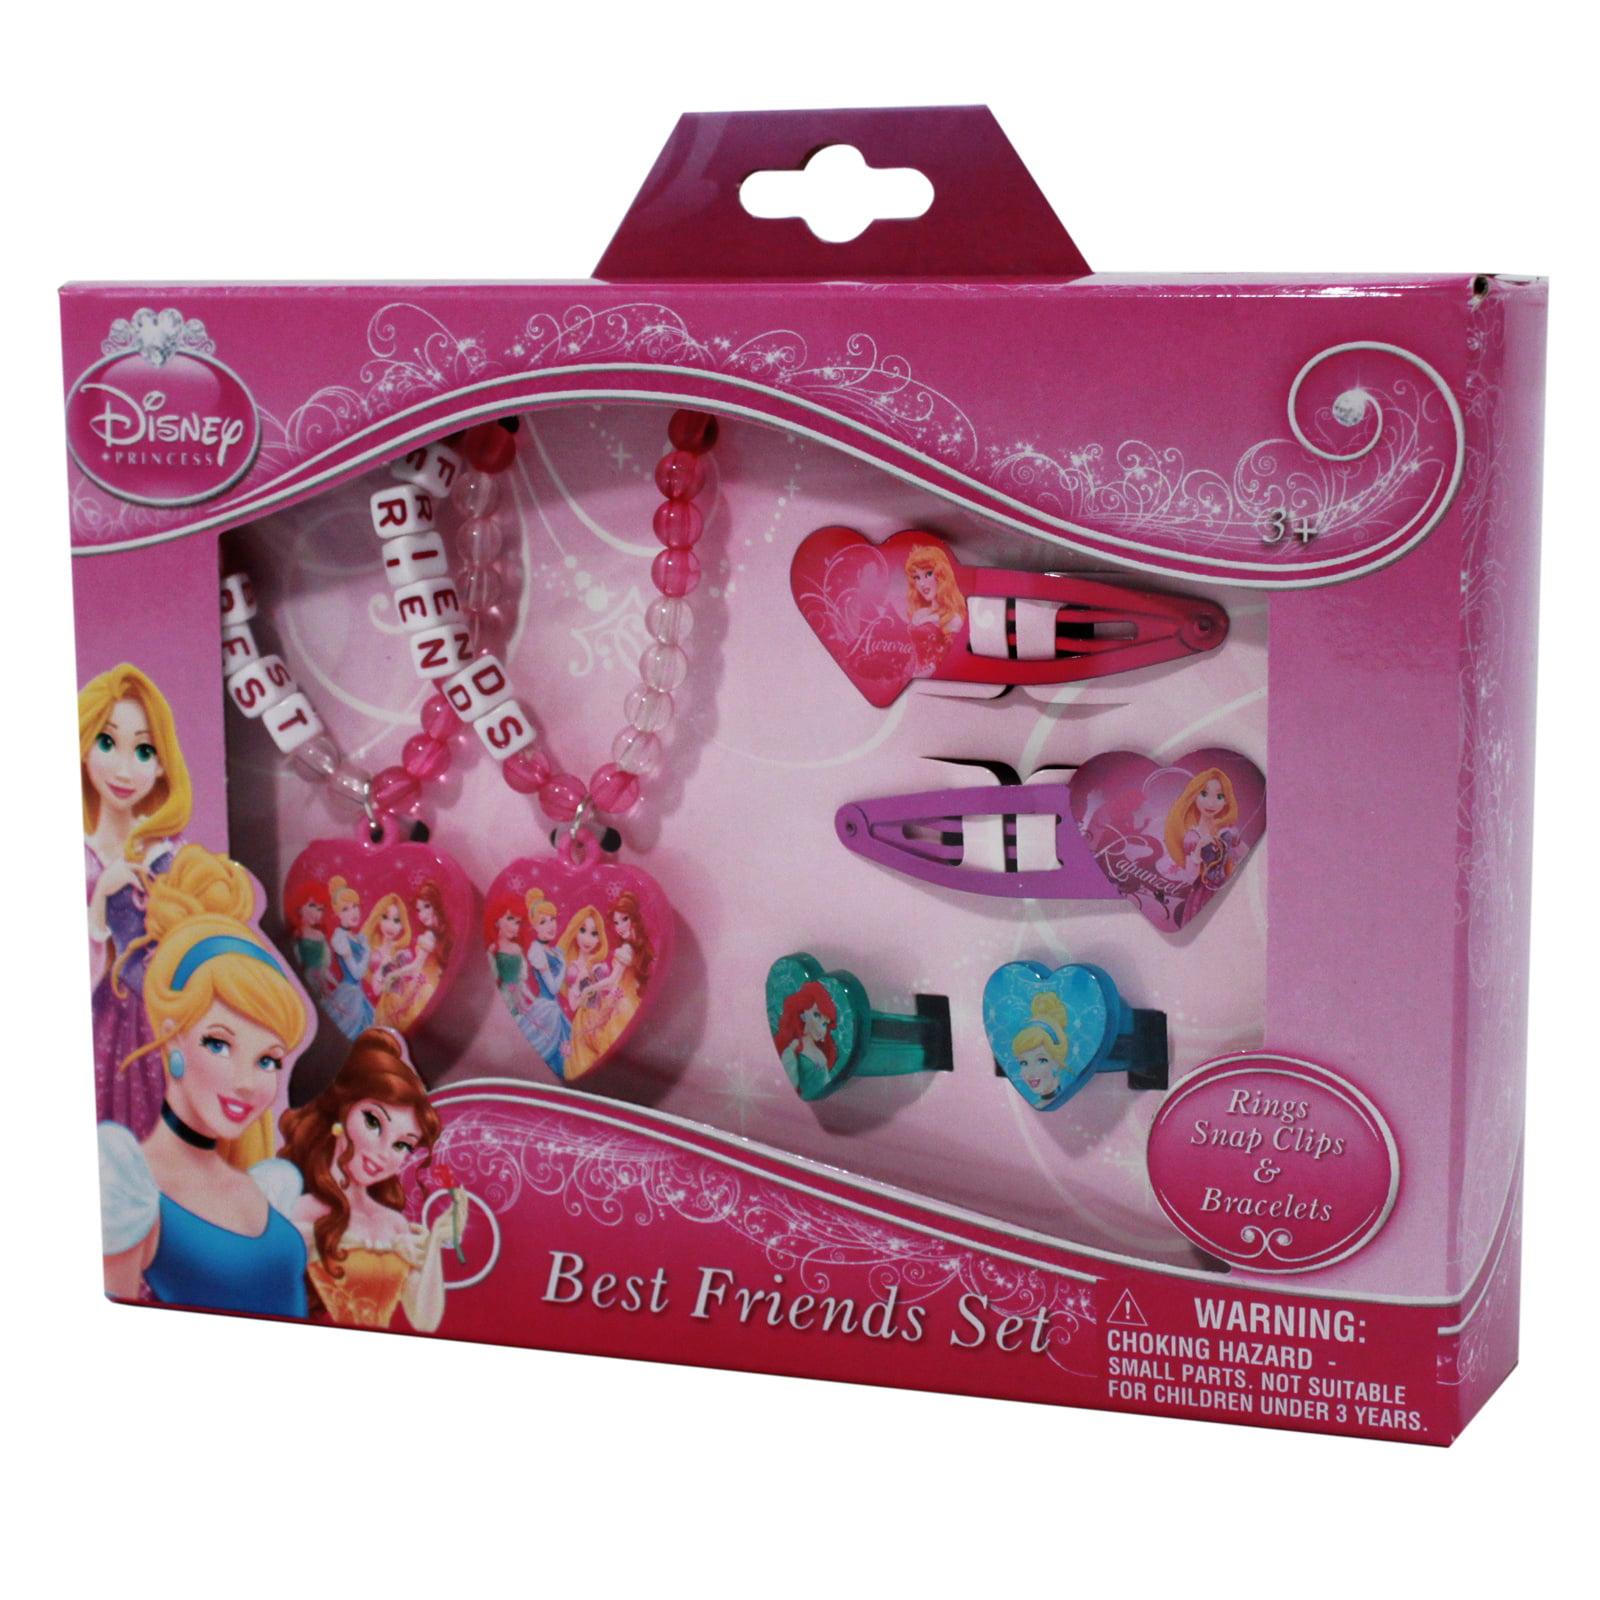 Disney Princess Best Friend Dress-up Hair Styling Set with Bracelets ...